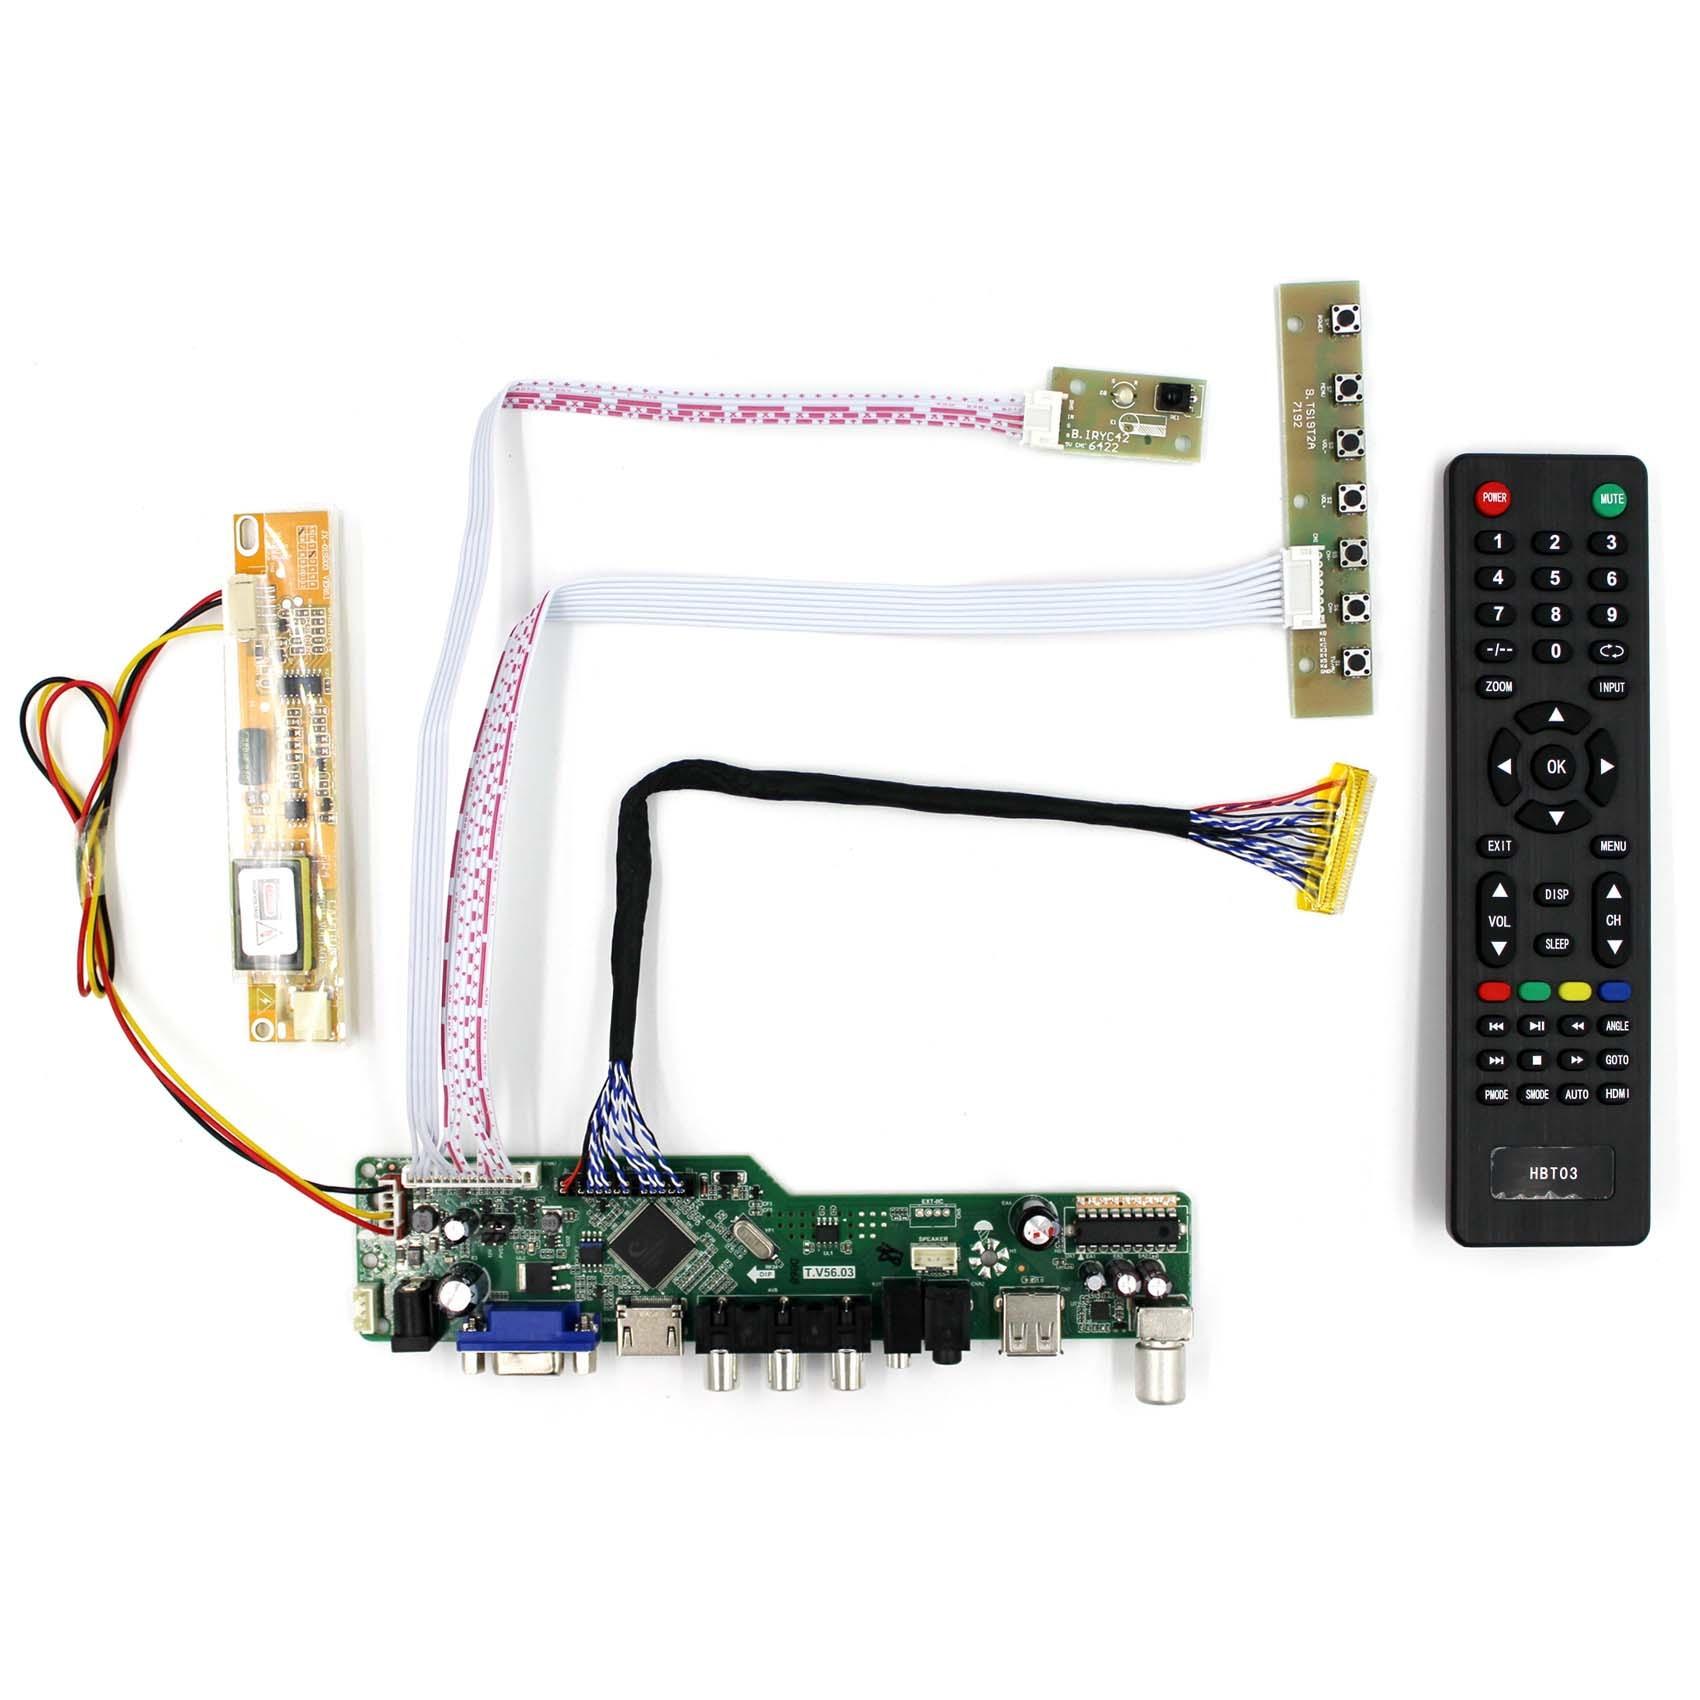 HDMI VGA AV USB RF LCD плата контроллера T. V56.03 работает для ccfl подсветки 30pin lvds LCD 17 дюймов 1440x900 B170PW01 V1